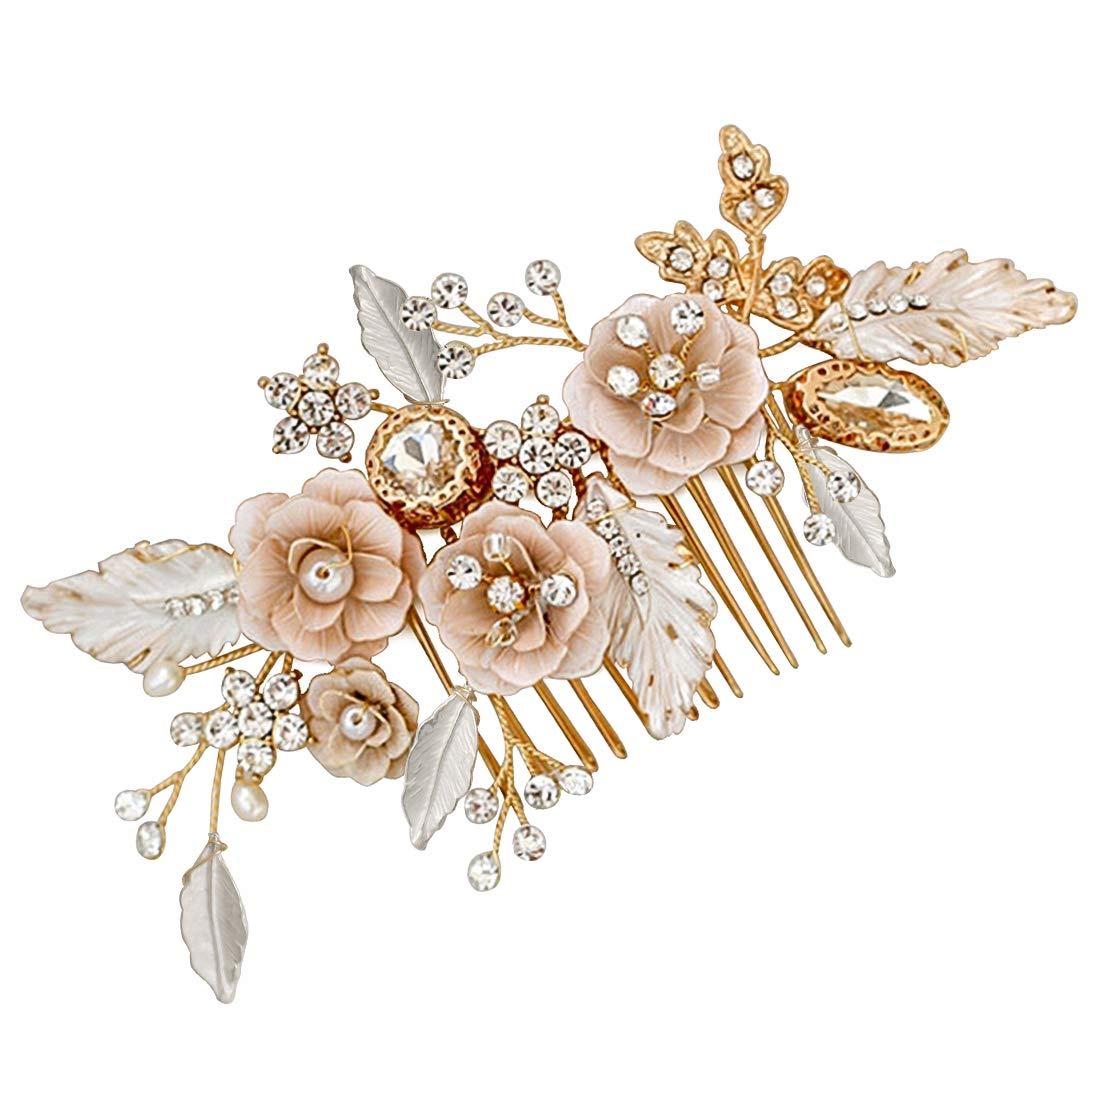 LovShe Gold Bridal Hair Accessories Flower Hair Comb Bride Hair Accessories Wedding Crystal Hair Comb Rhinestone by LovShe